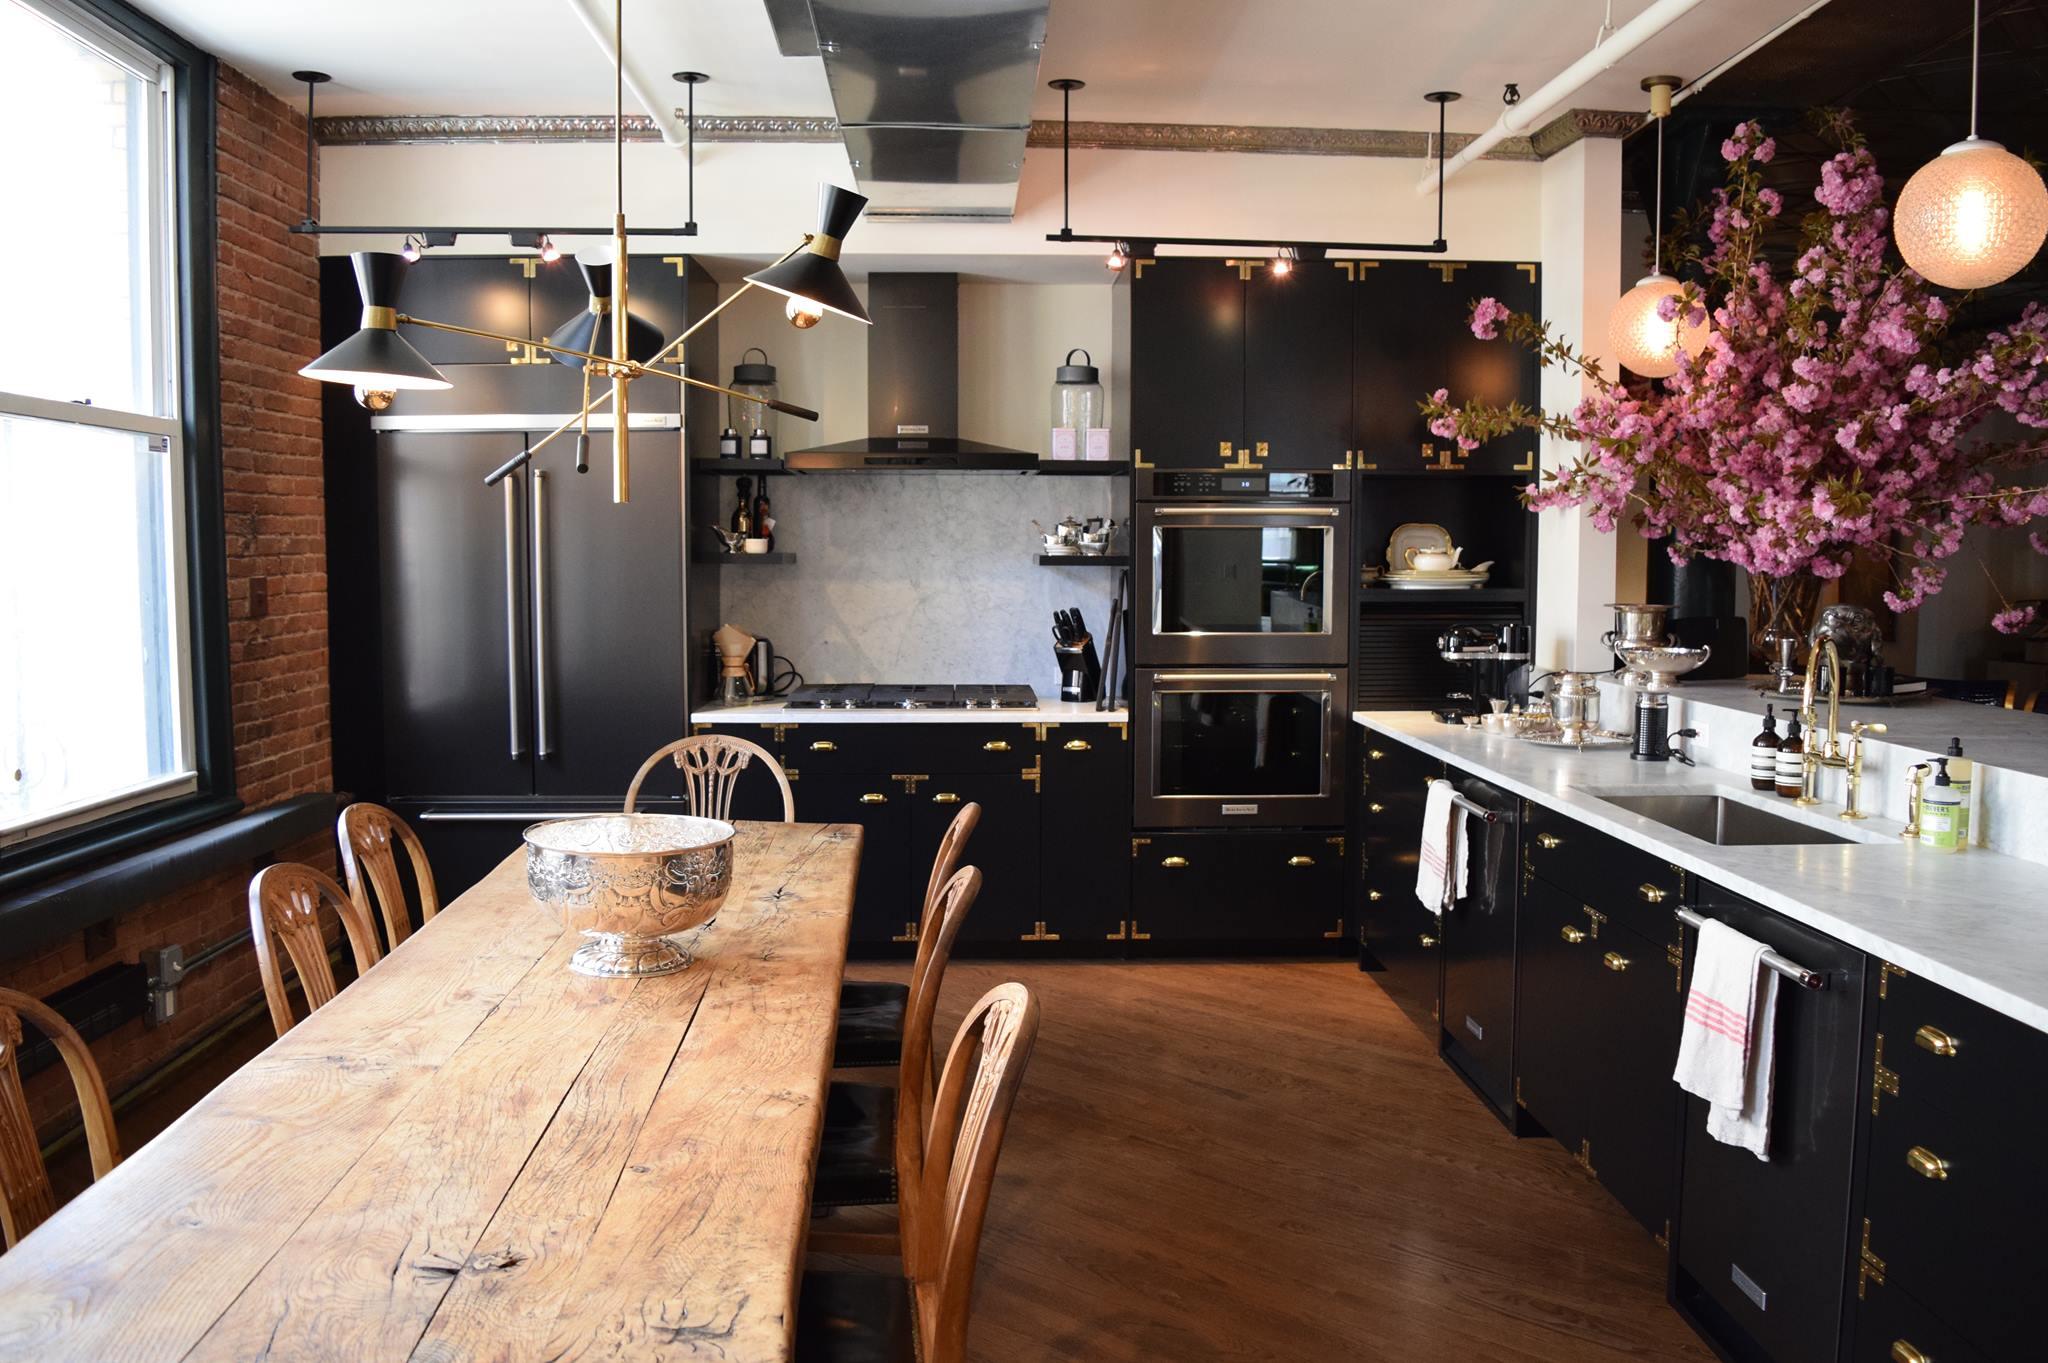 Kitchenaid Black Stainless Steel Appliances Appliances Cabinets